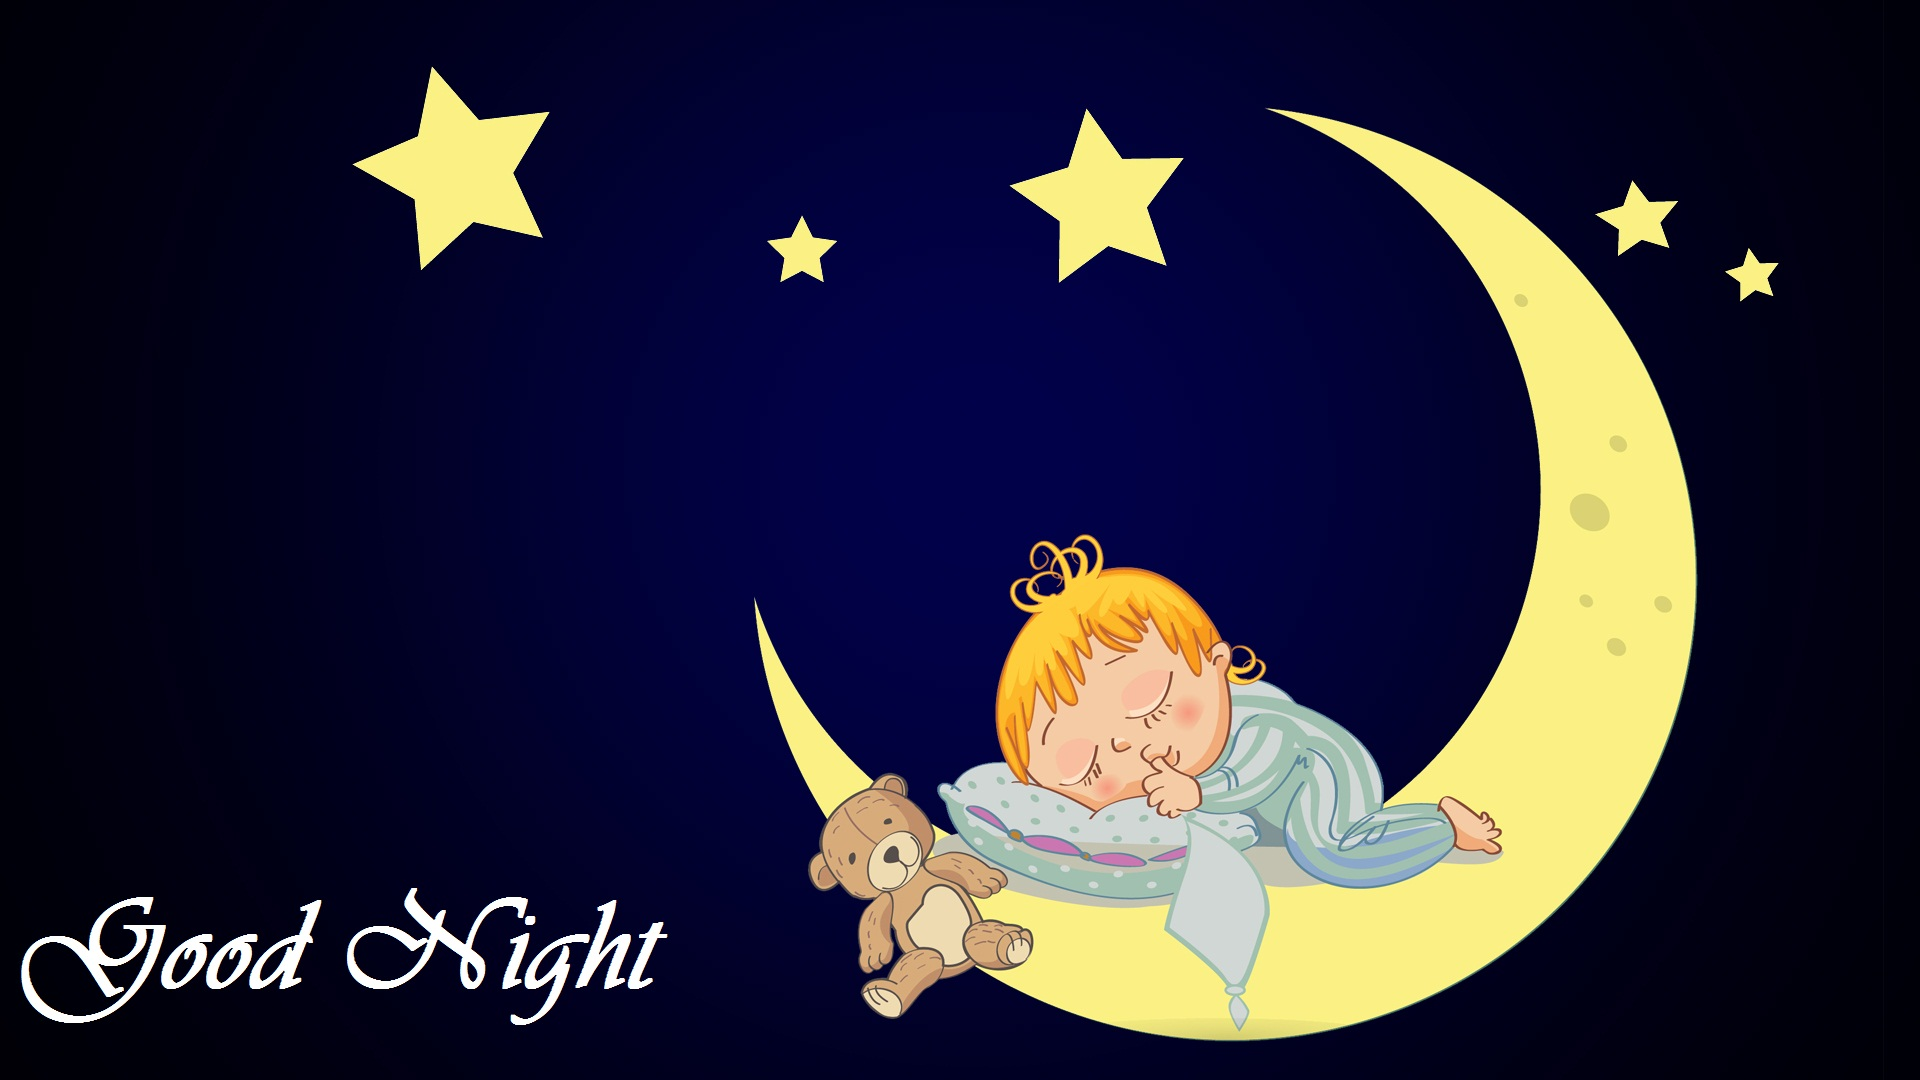 good night moon baby start dall image